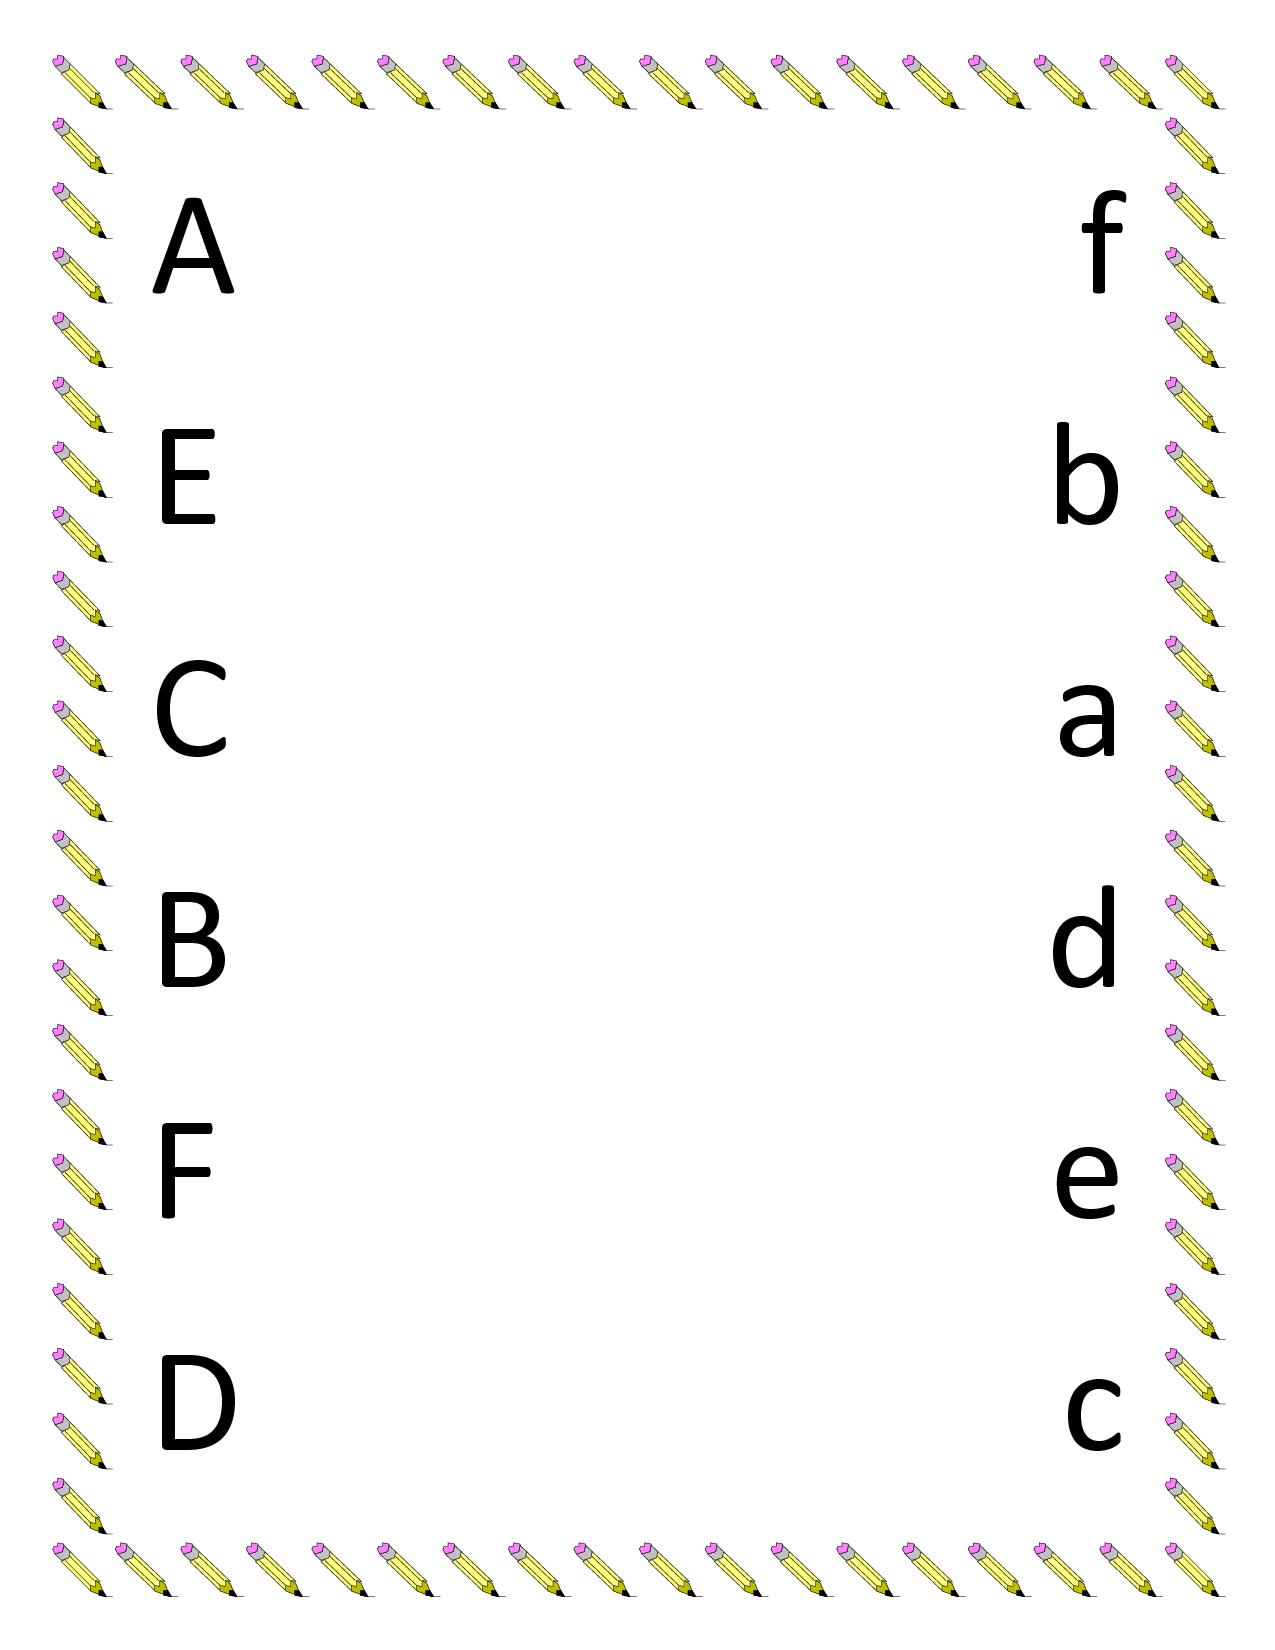 Kindergarten Worksheets Preschool Worksheets Printables For Kids 16